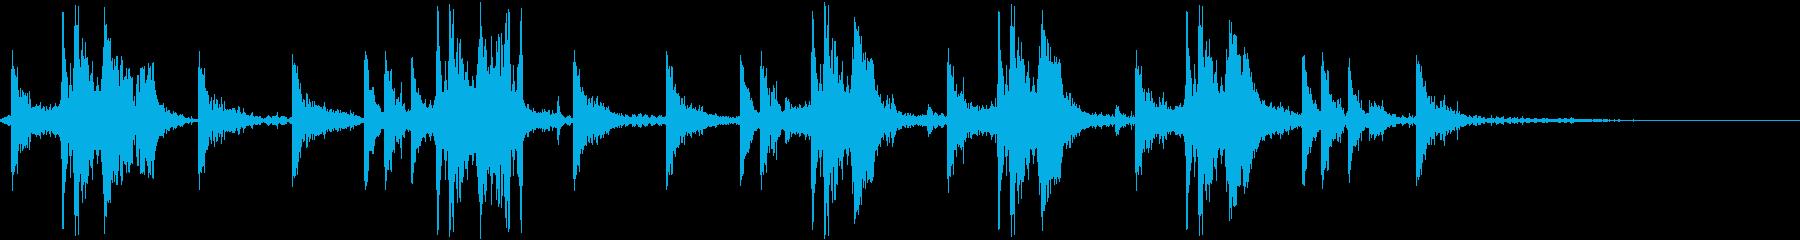 DJ効果音 元気よくなるYoの再生済みの波形